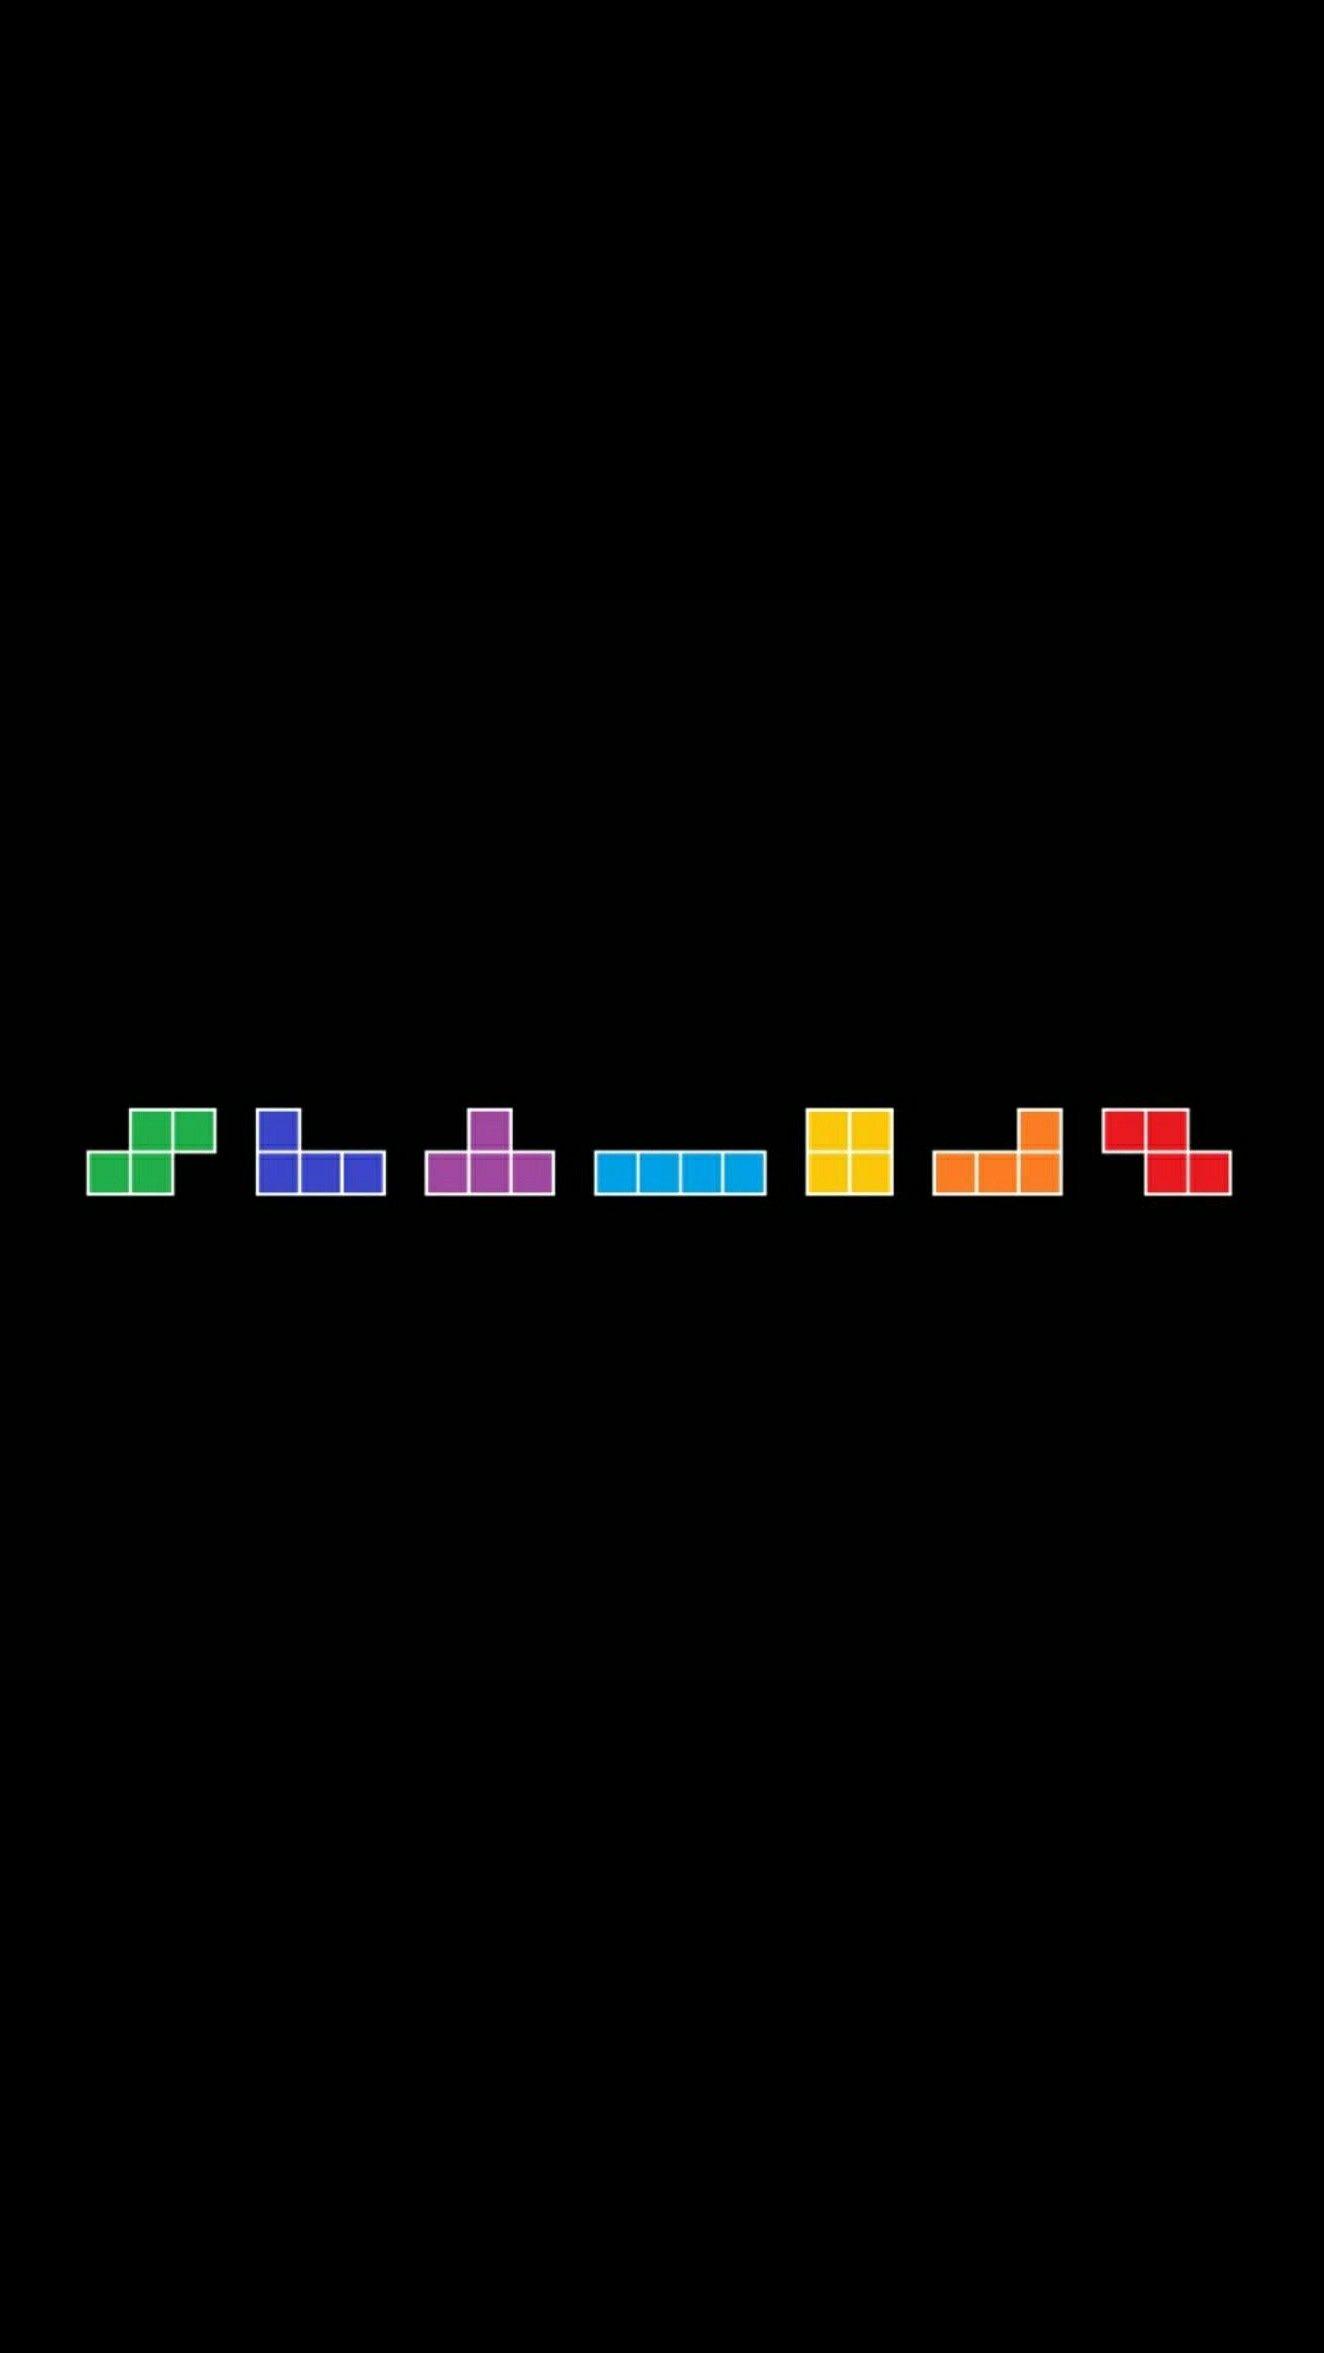 Tetris tecno in 2019 Pinterest Wallpaper Iphone wallpaper 1324x2353